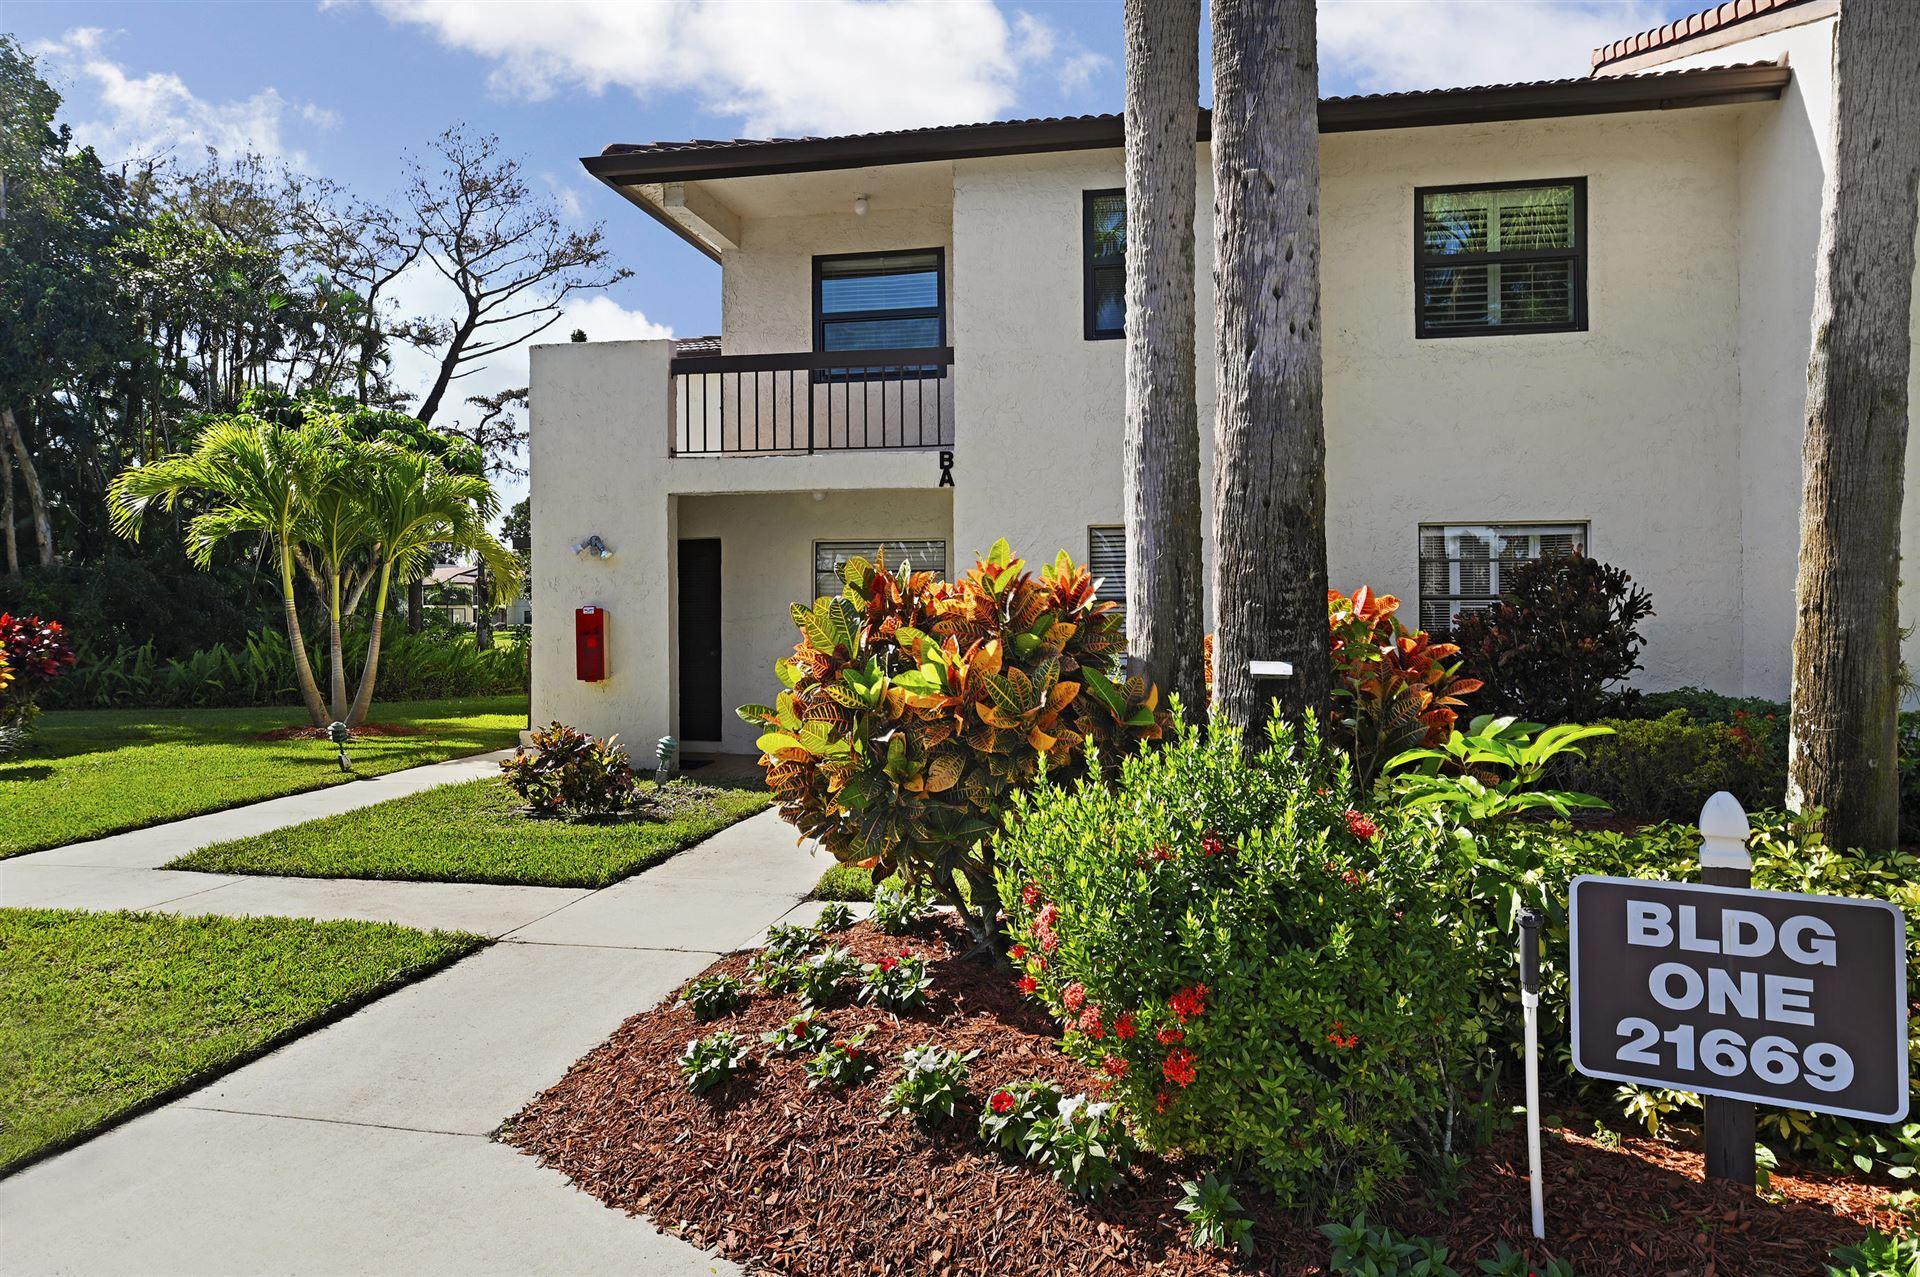 21669 Tall Palm Circle #1b, Boca Raton, FL 33433 - #: RX-10676185